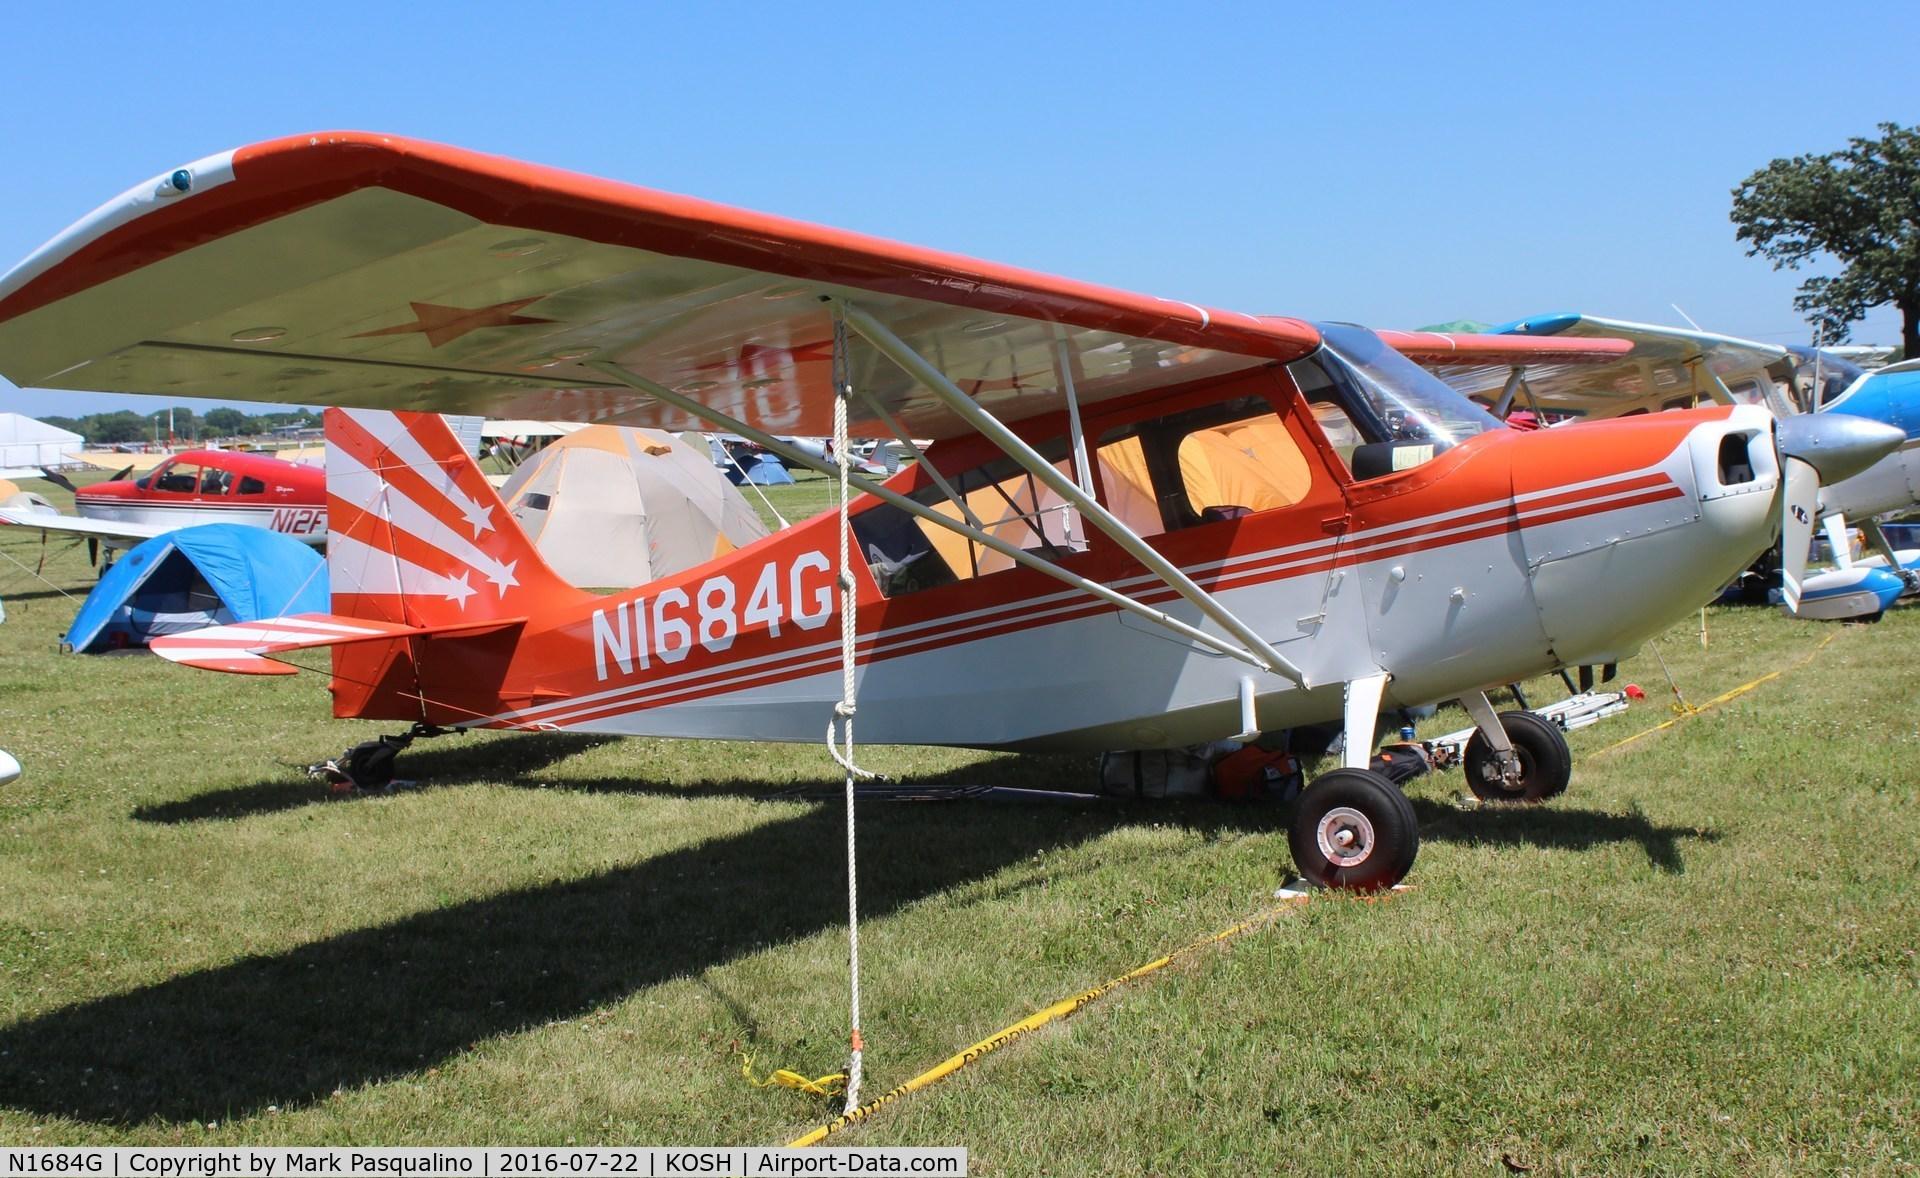 N1684G, 1968 Champion 7KCAB C/N 139, Champion 7KCAB